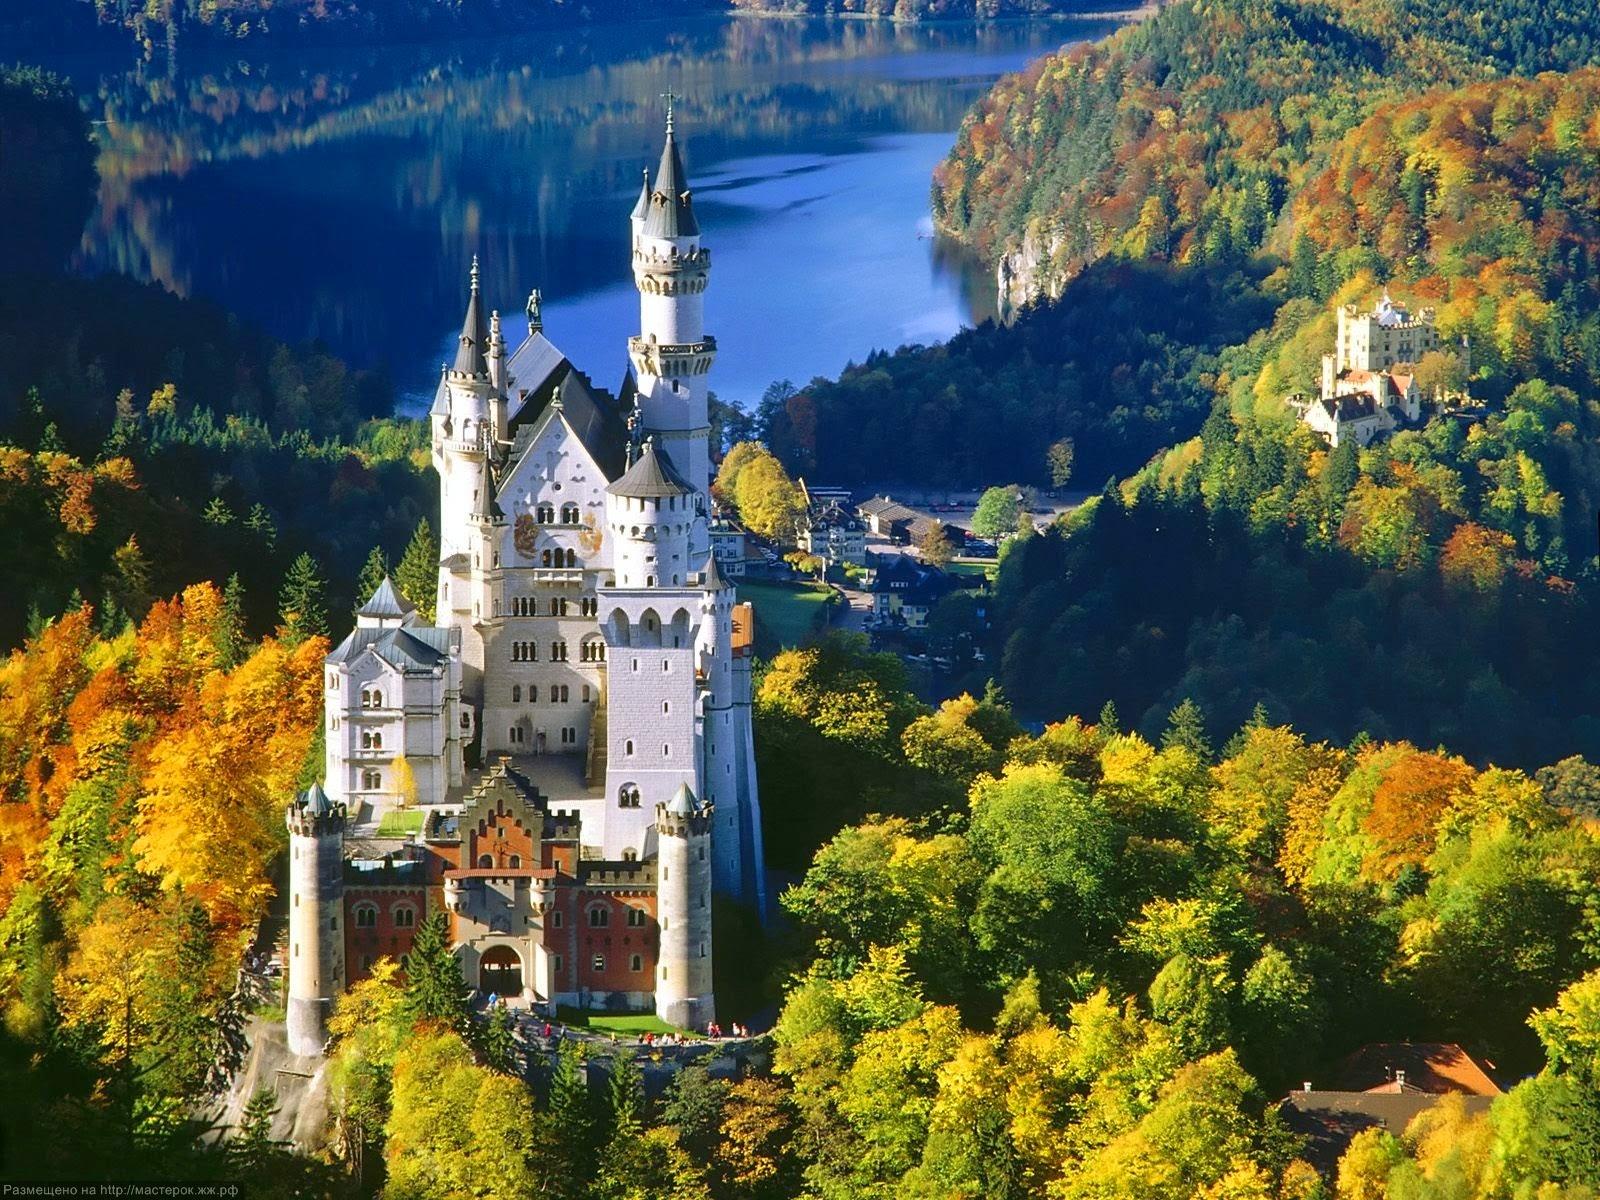 neuschwanstein castle: 8 neuschwanstein castle wallpaper hd